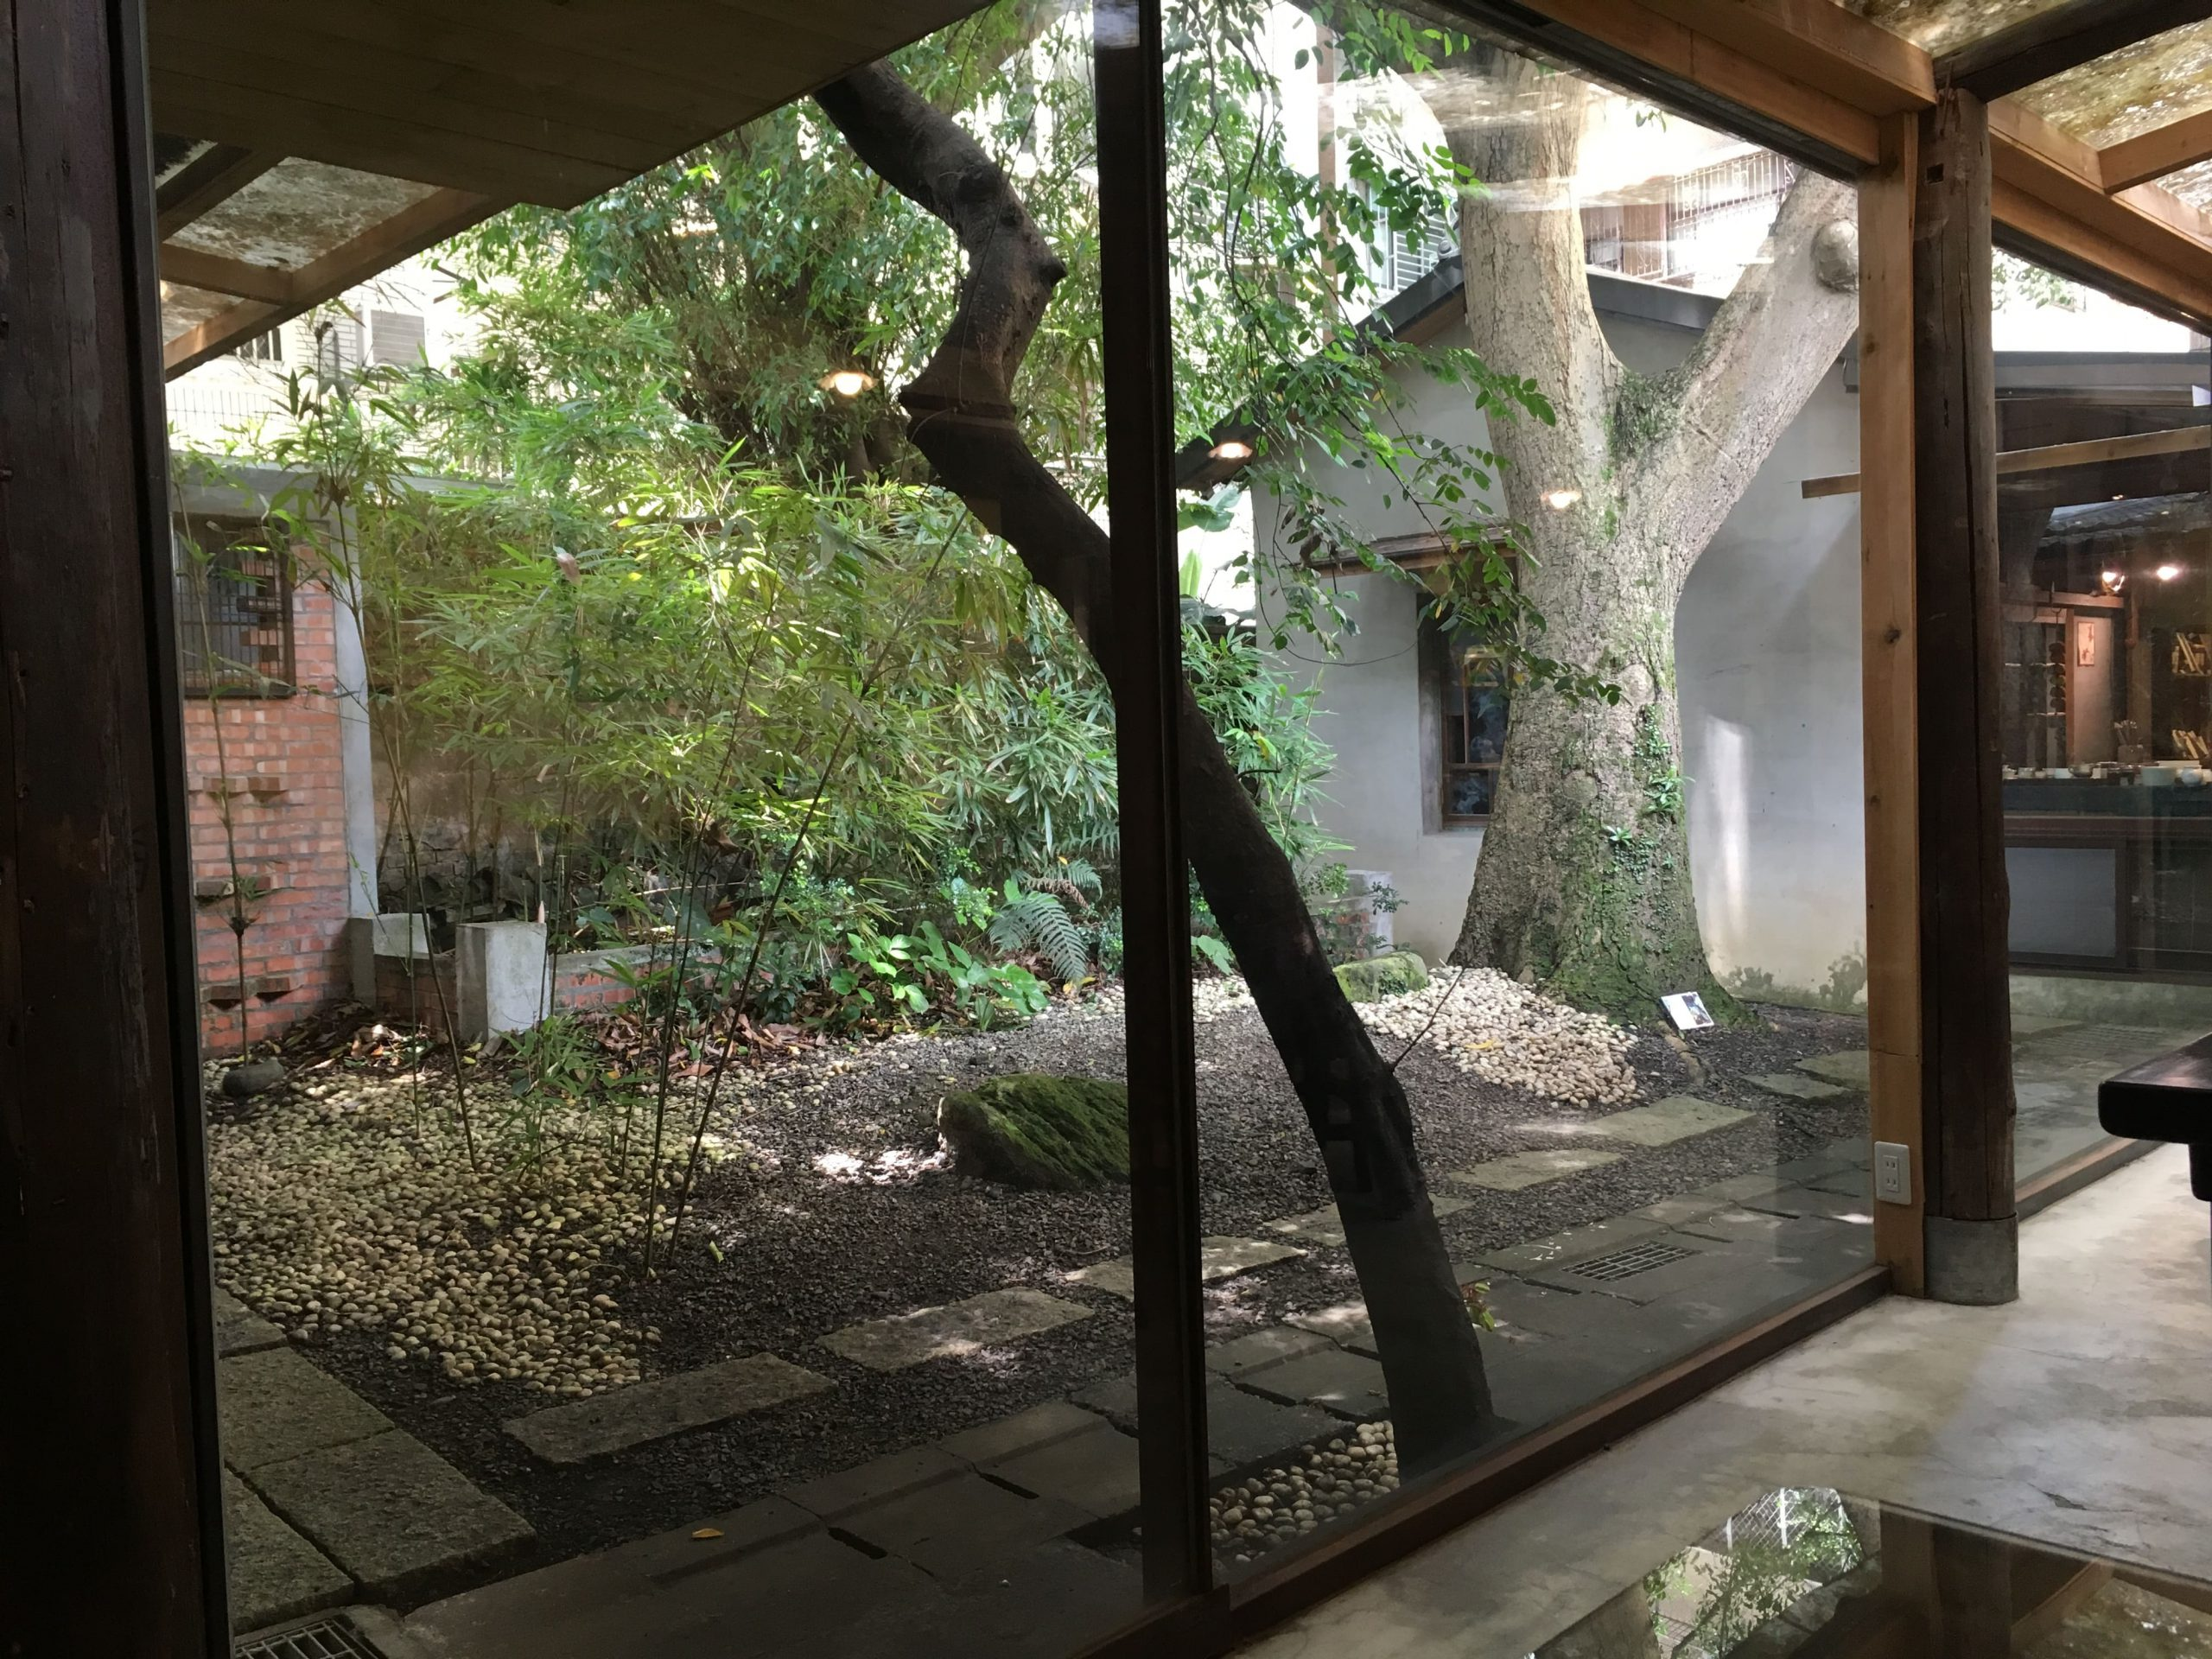 Qingtian_TeaHouse_Jardin_Interieur_TeaVoyages